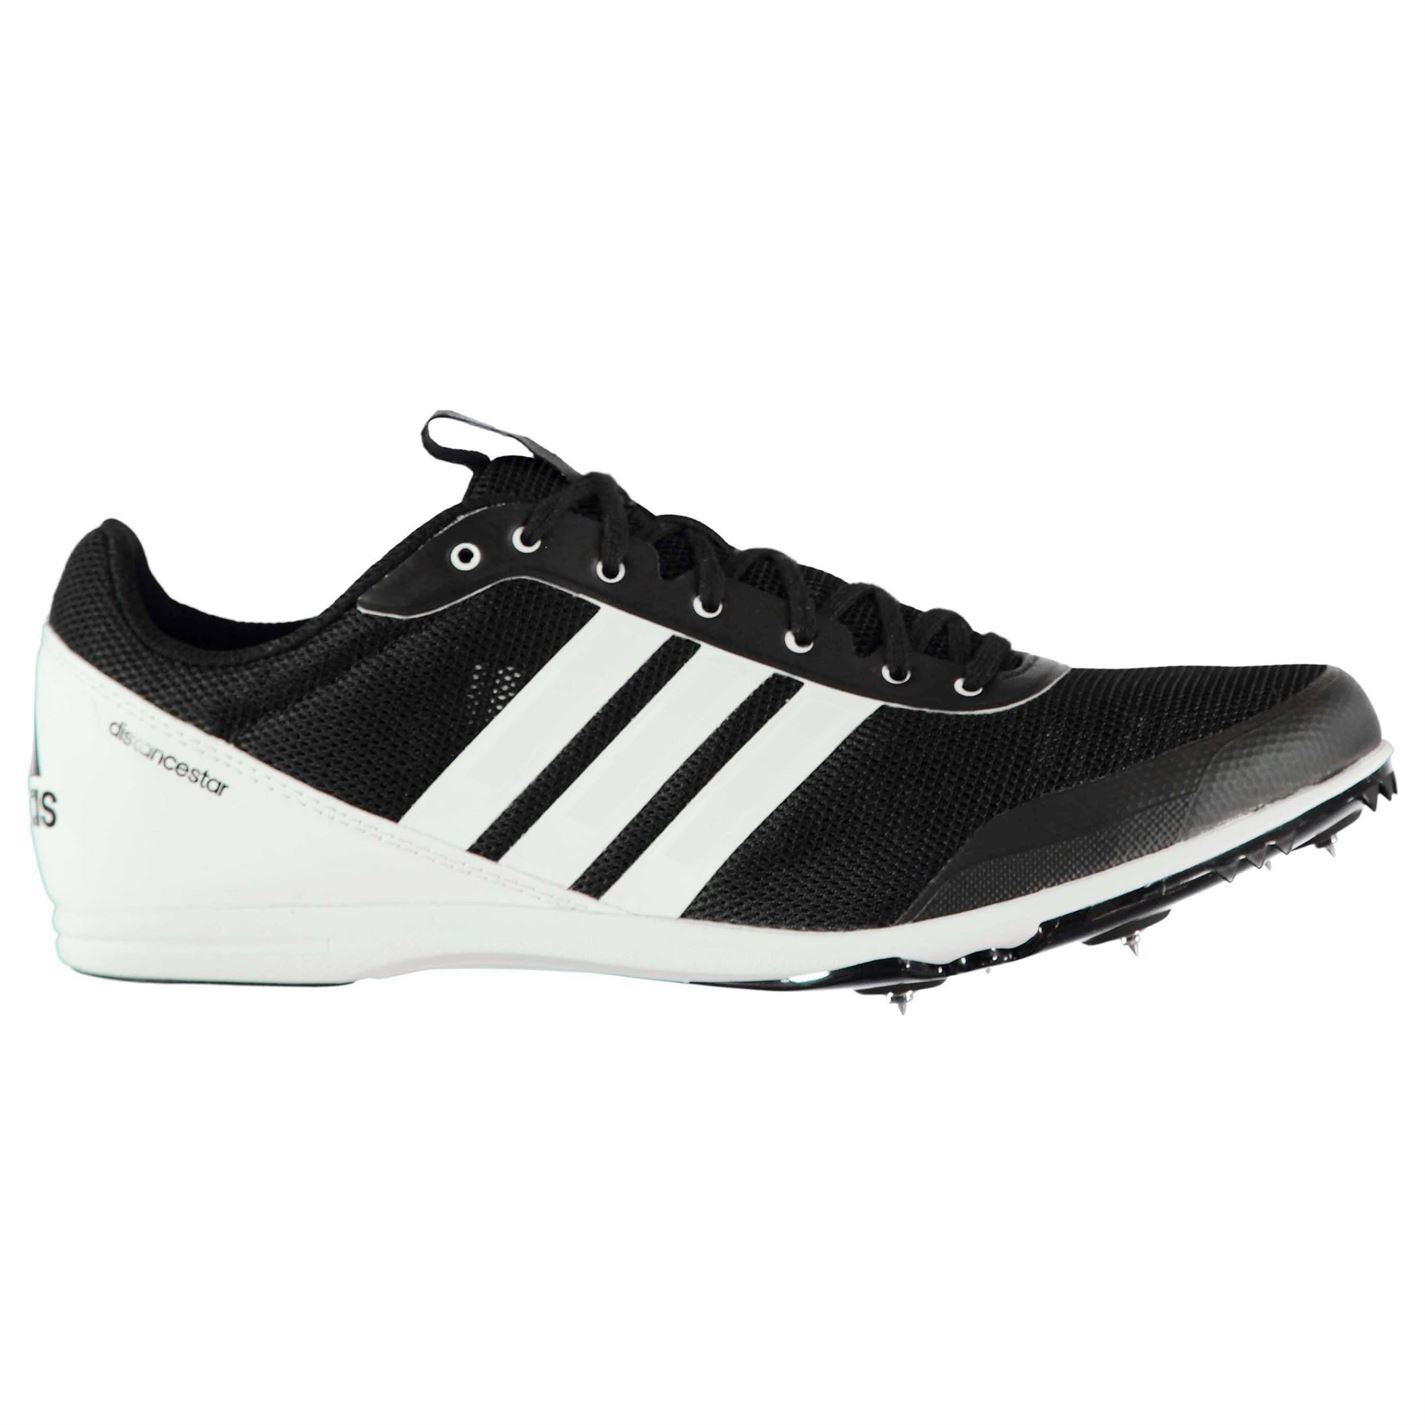 adidas Damenschuhe Distance Star Track Schuhes Running Breathable Mesh Upper Seamless